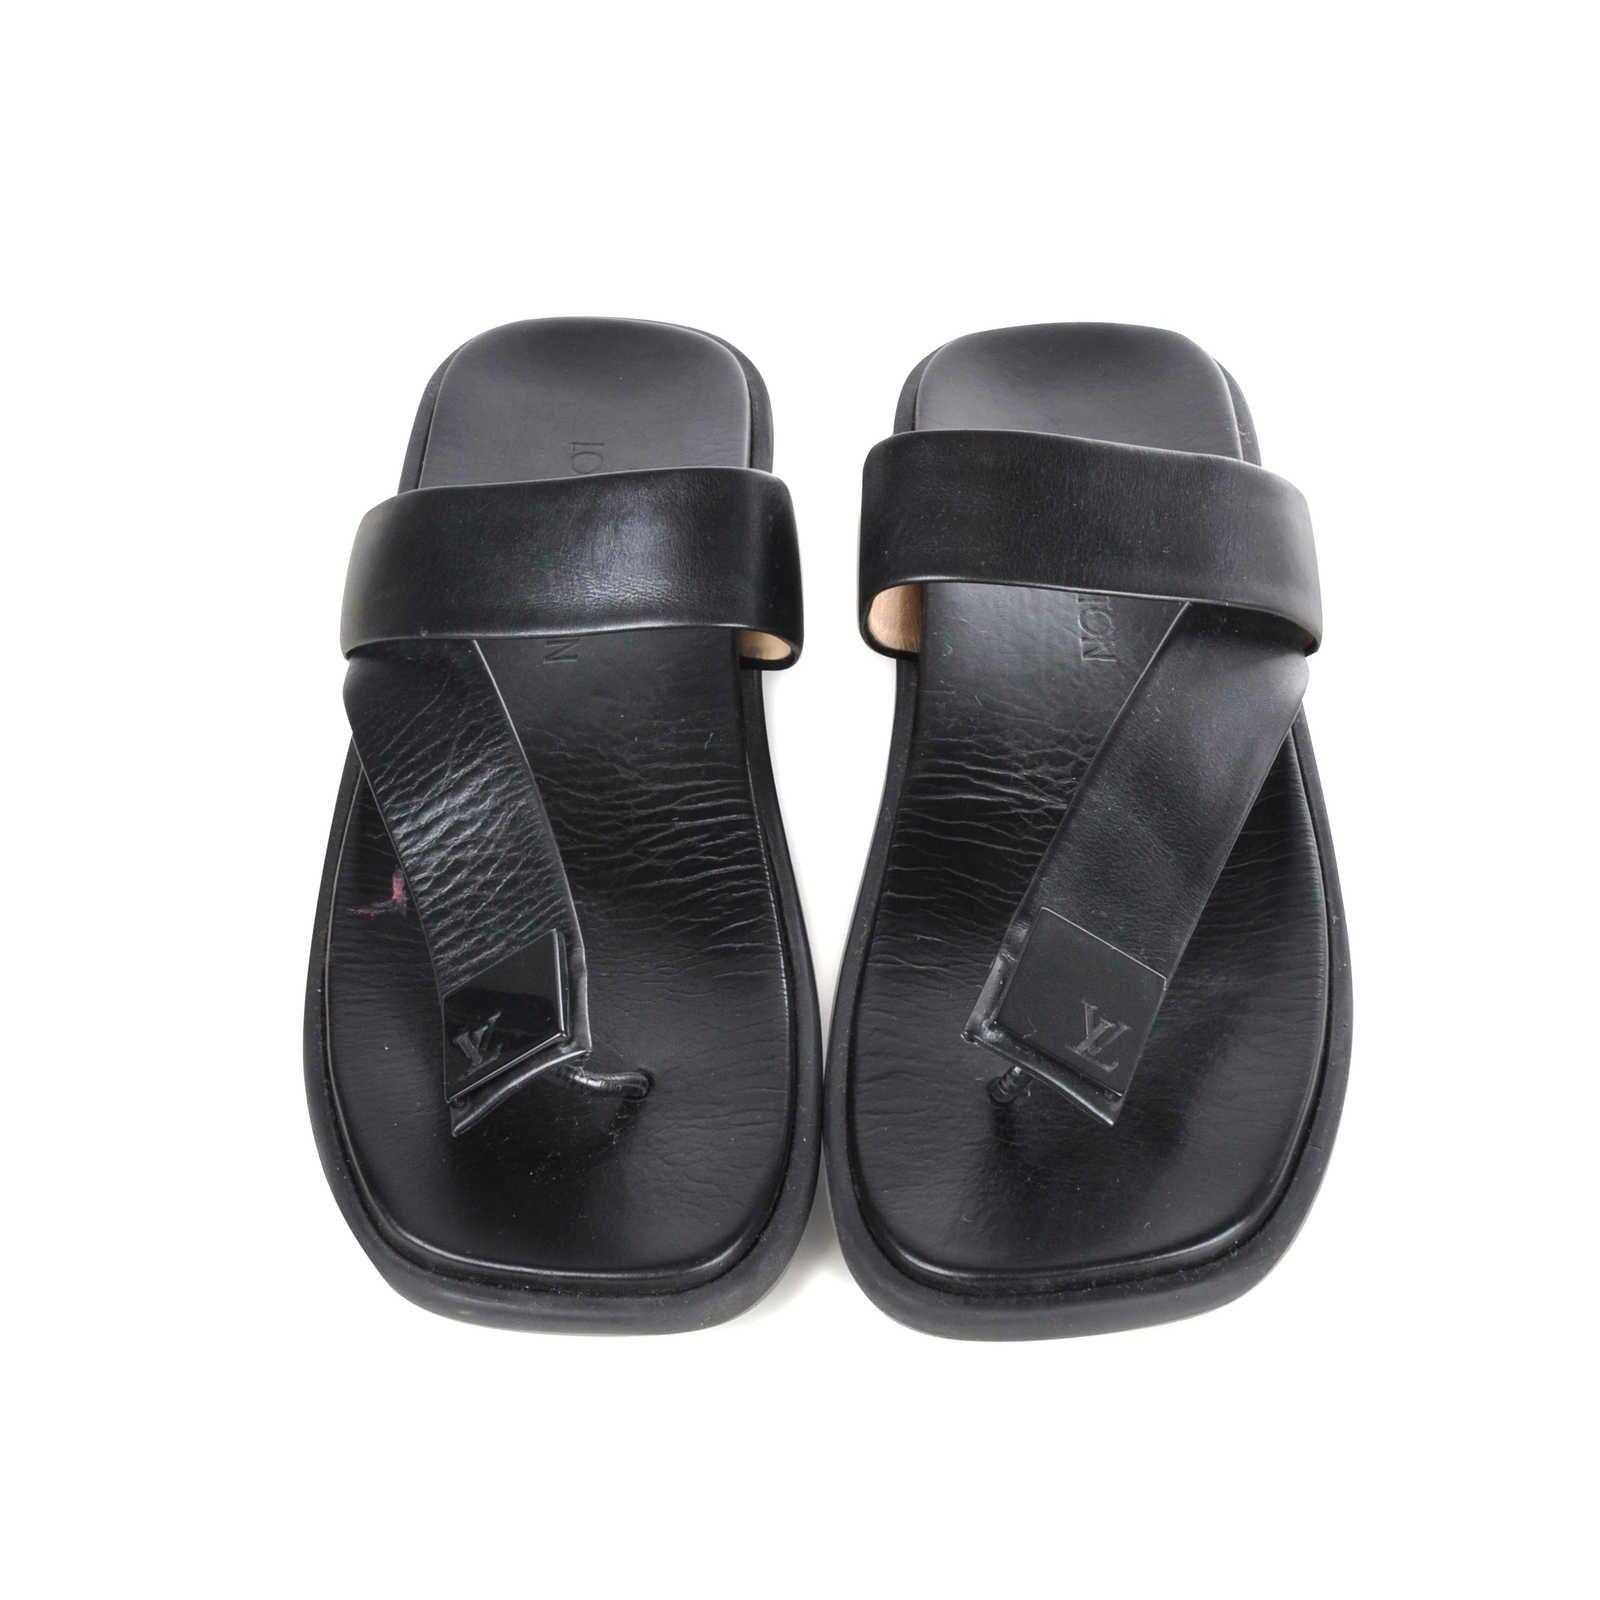 d98b1143893d Louis Vuitton rubber platform thong slippers with black leather straps  designed with a black square applique